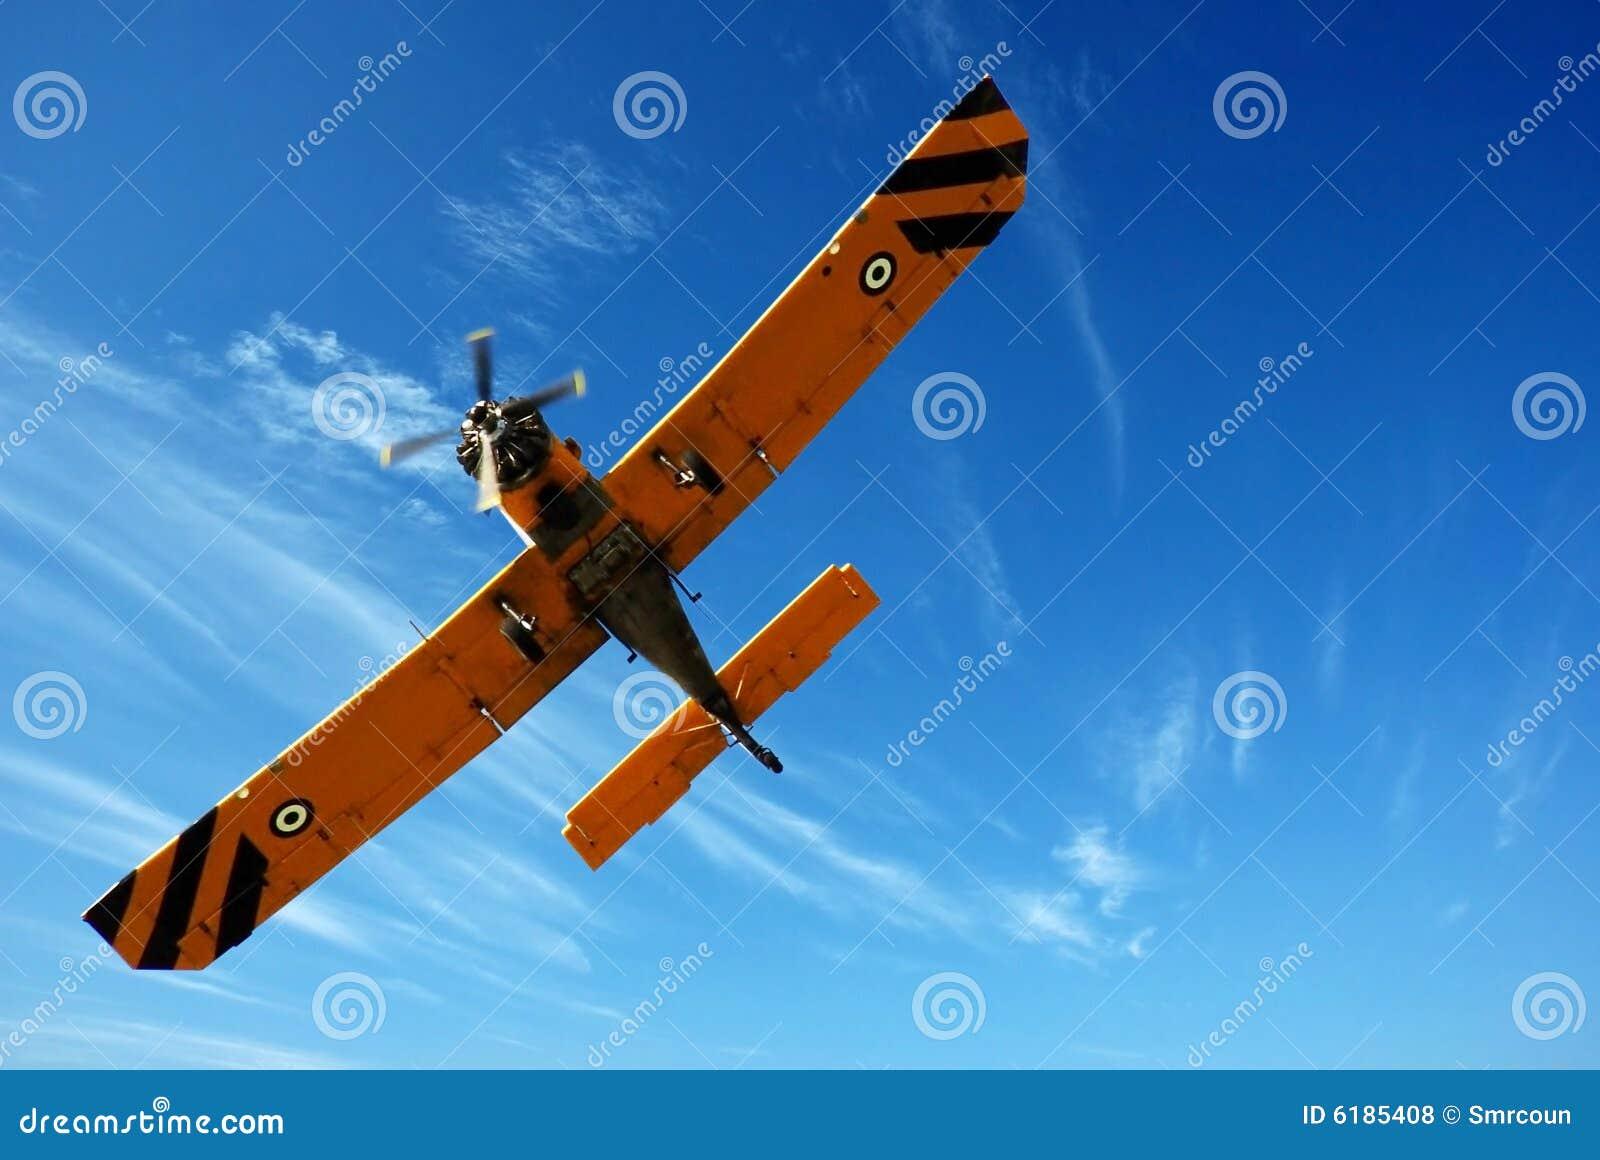 Klein vliegtuig in blauwe hemel